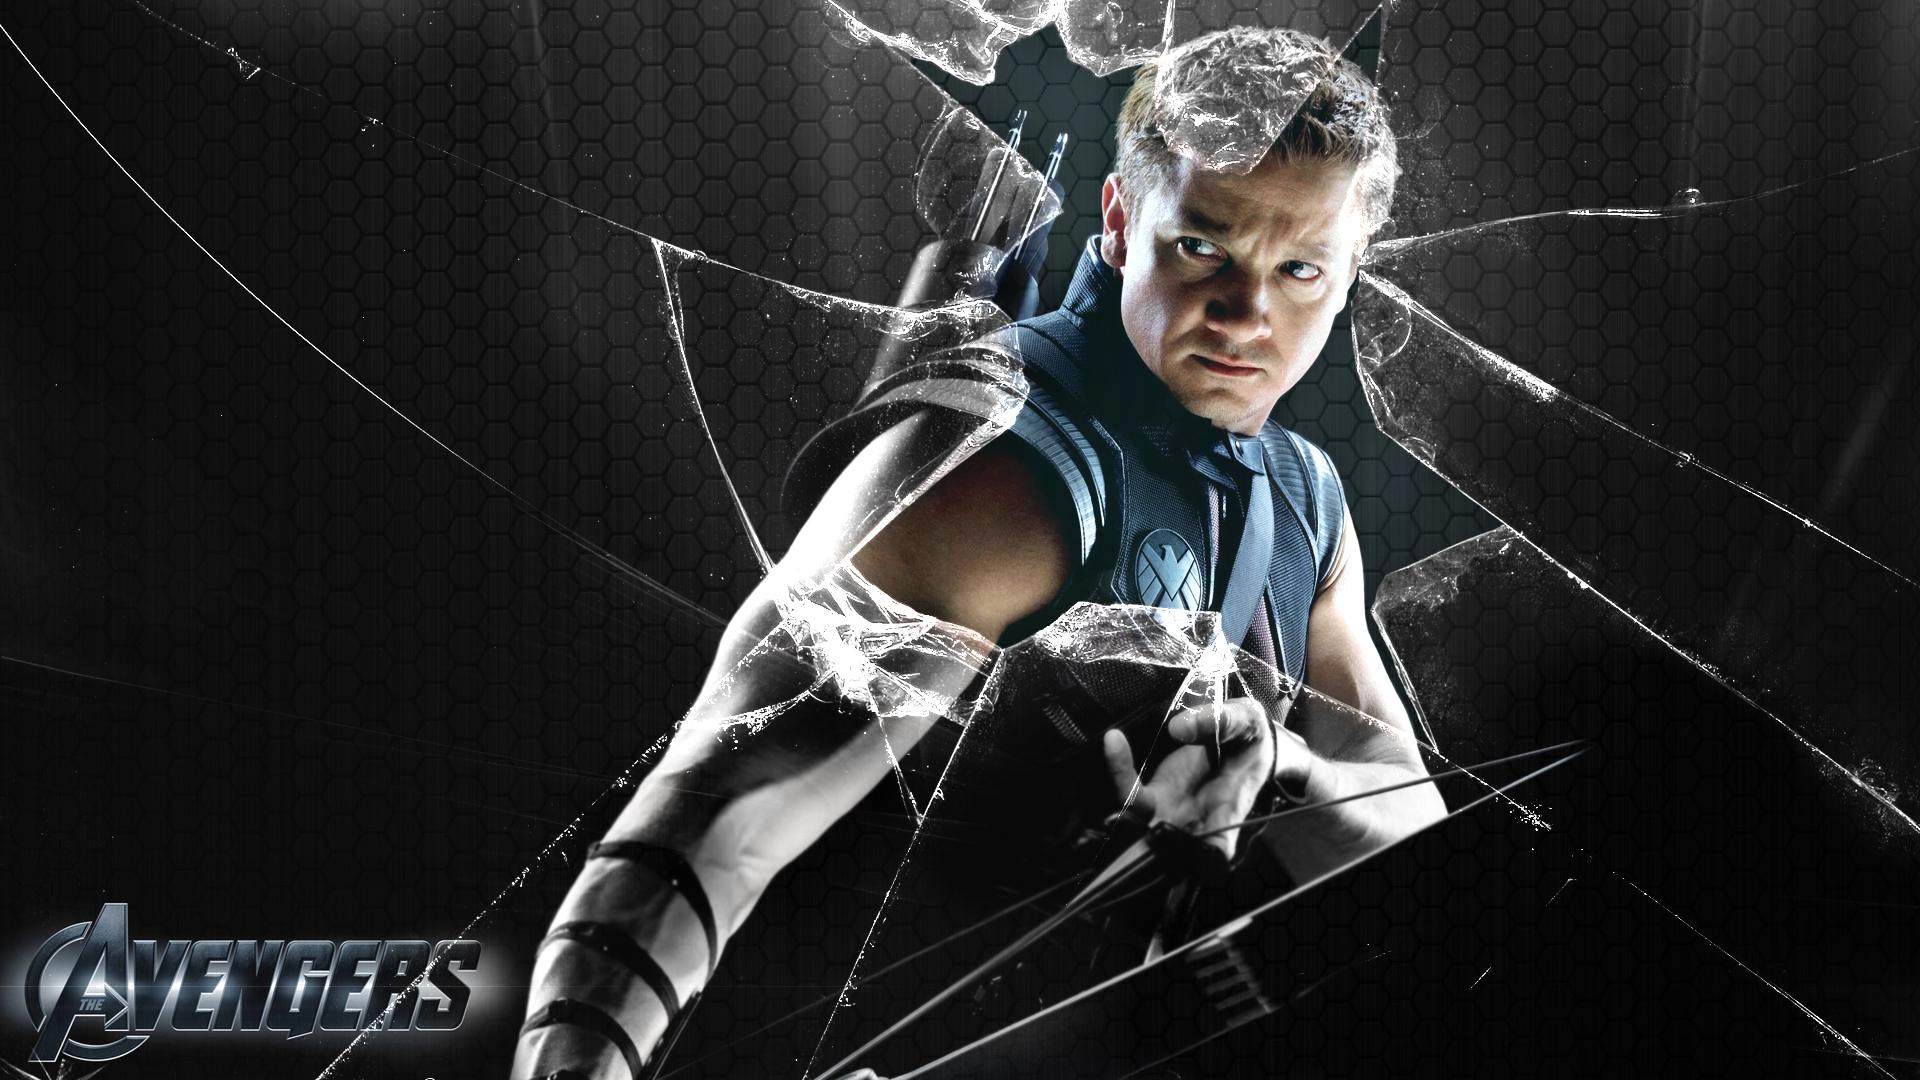 Wallpapers Hawkeye Avengers 3200 X 2000 2980 Kb Jpeg HD Wallpapers 1920x1080